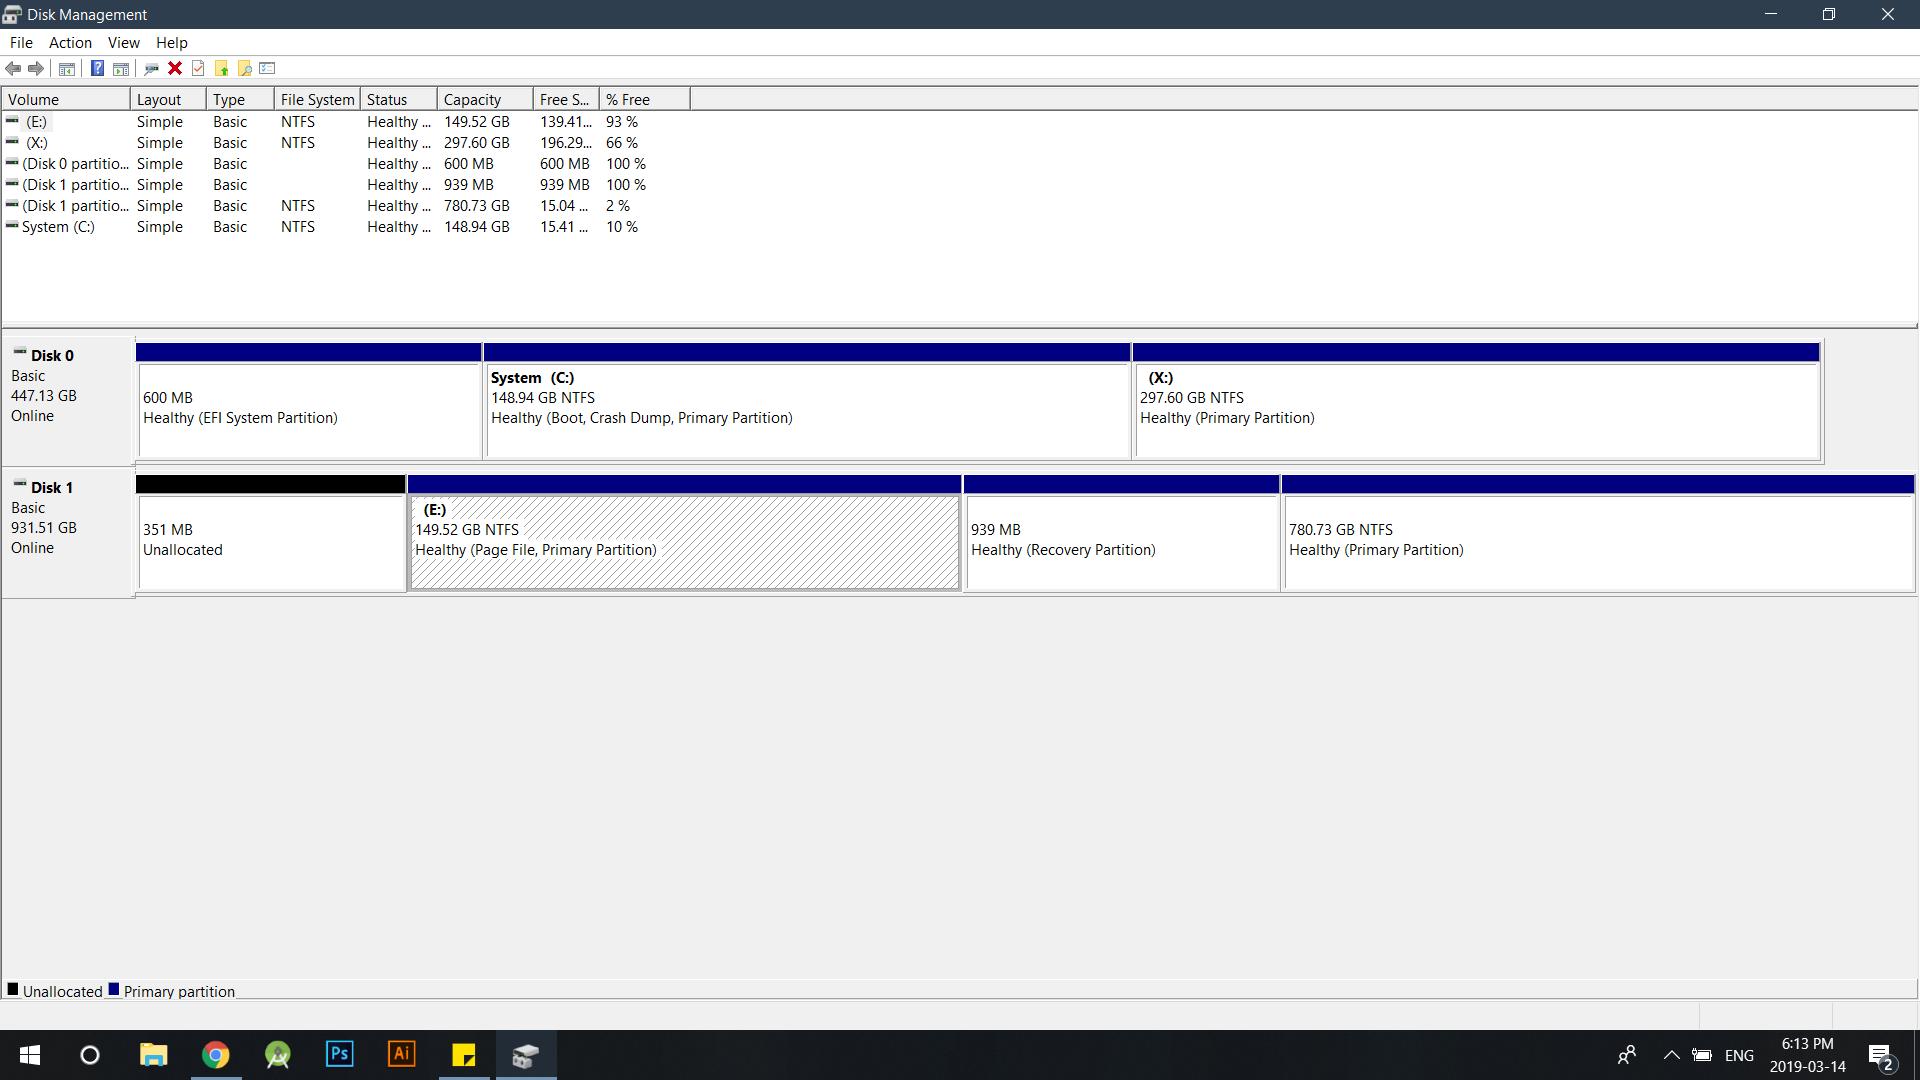 Windows doesn't hibernate properly after migrating to ssd 4fde1688-c61e-4f96-85ac-38fc6d69f66b?upload=true.png